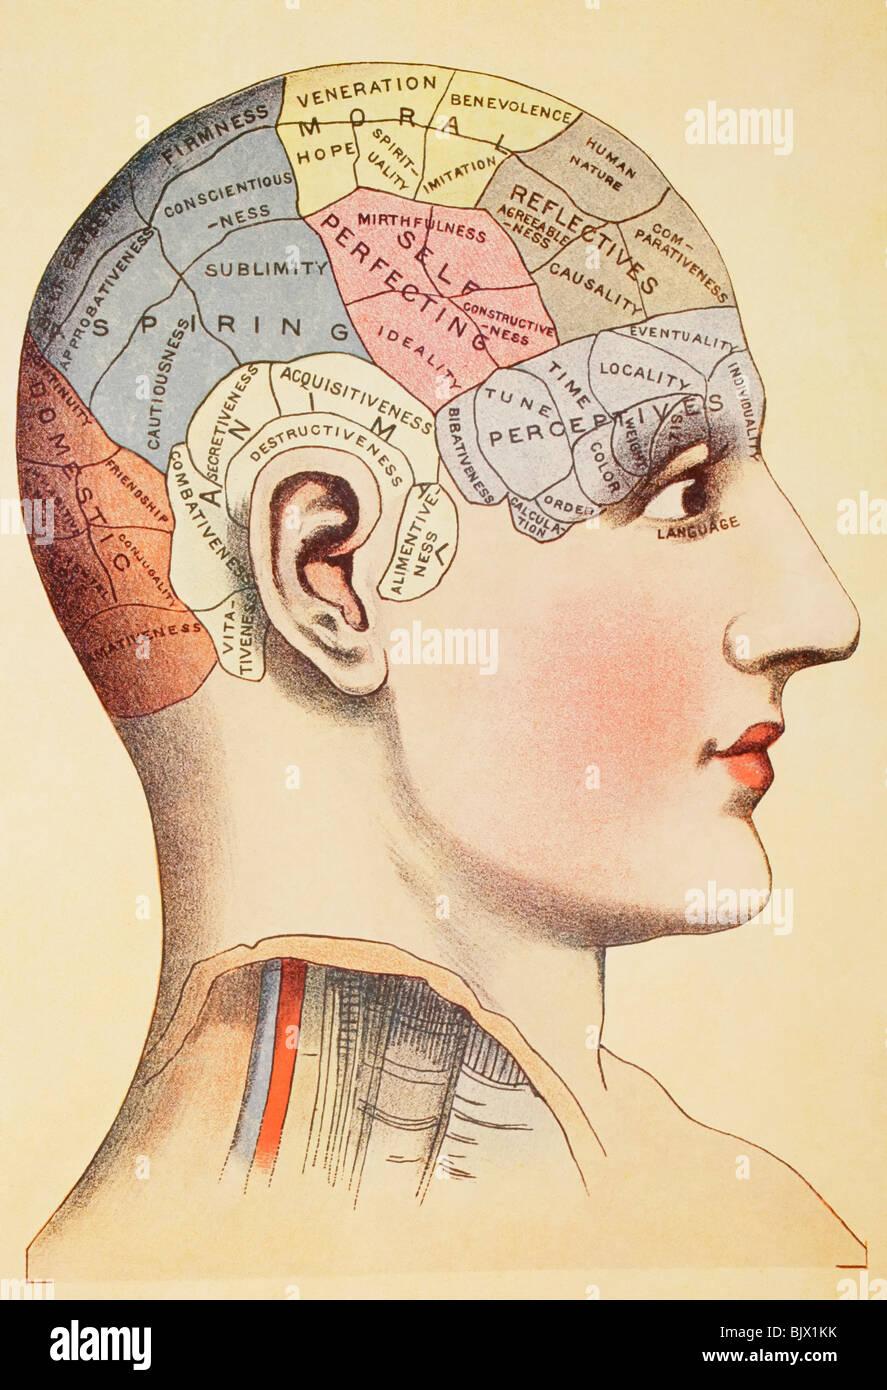 Un phrenological Mapa del cerebro humano. Imagen De Stock